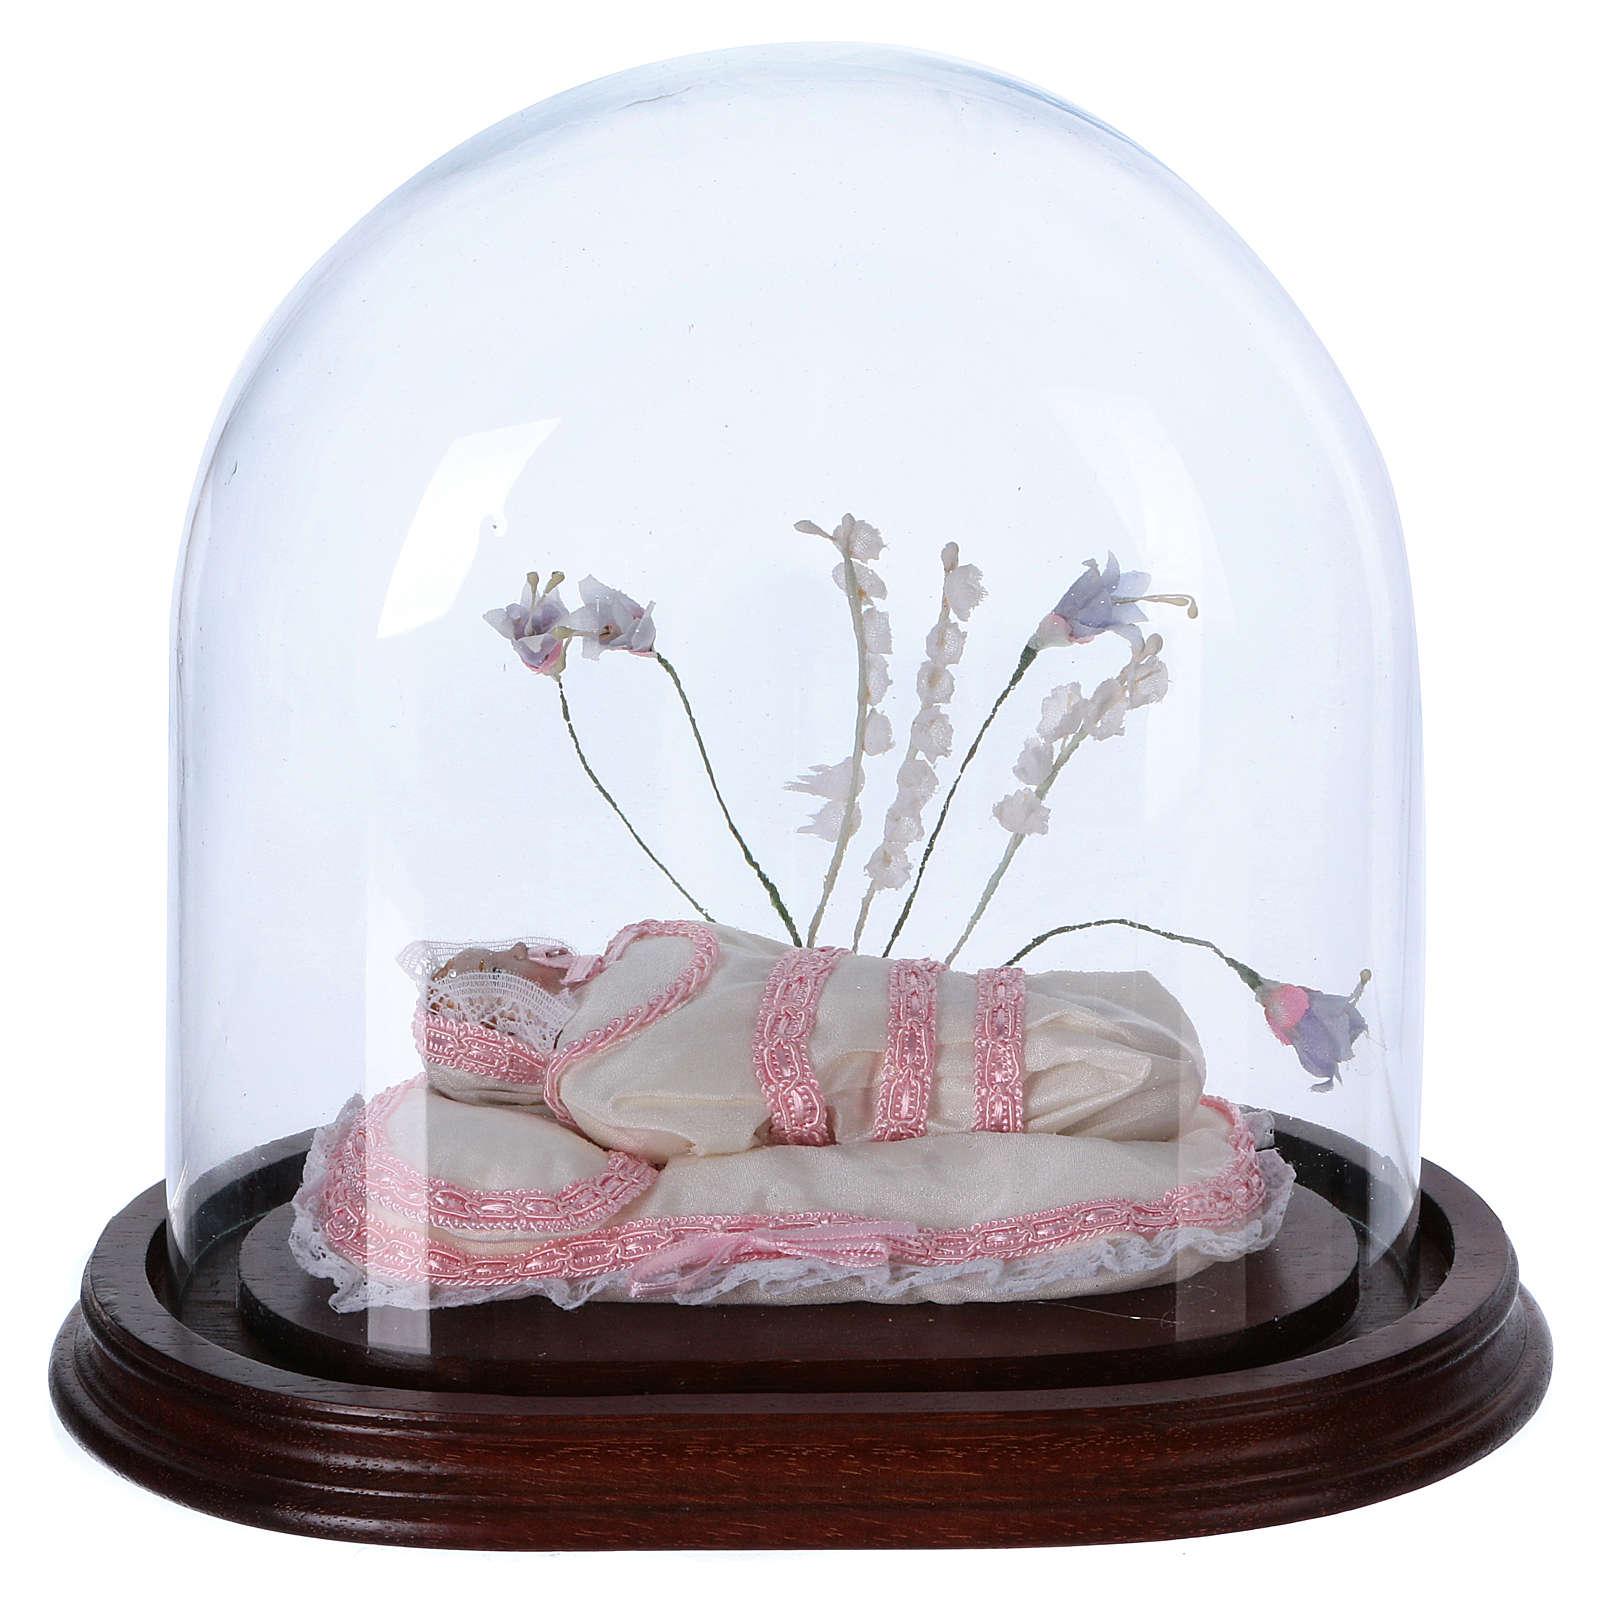 Maria bambina statua terracotta cm 18 in campana vetro 4